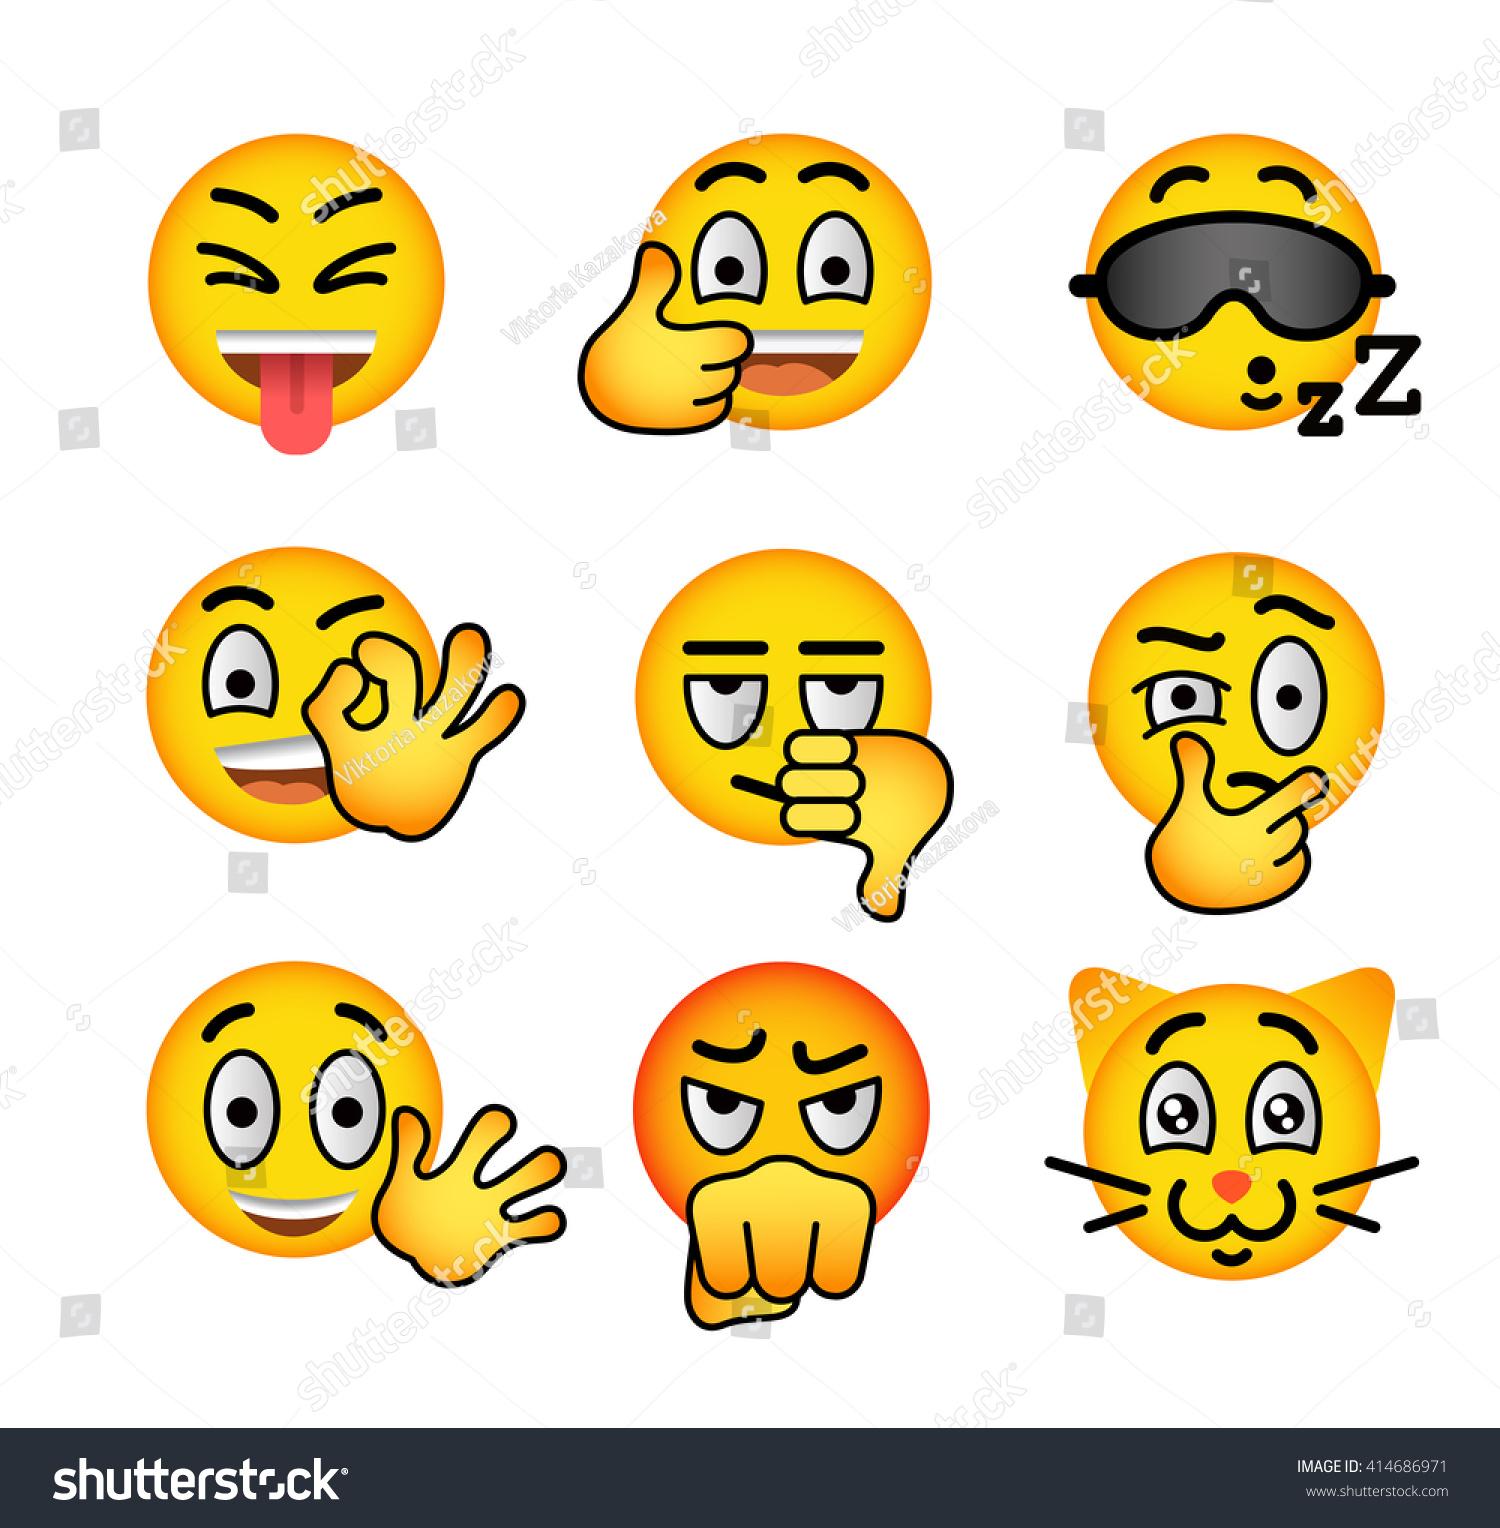 Emoji Emoticons Smiley Face Flat Vector Stock Vector Royalty Free